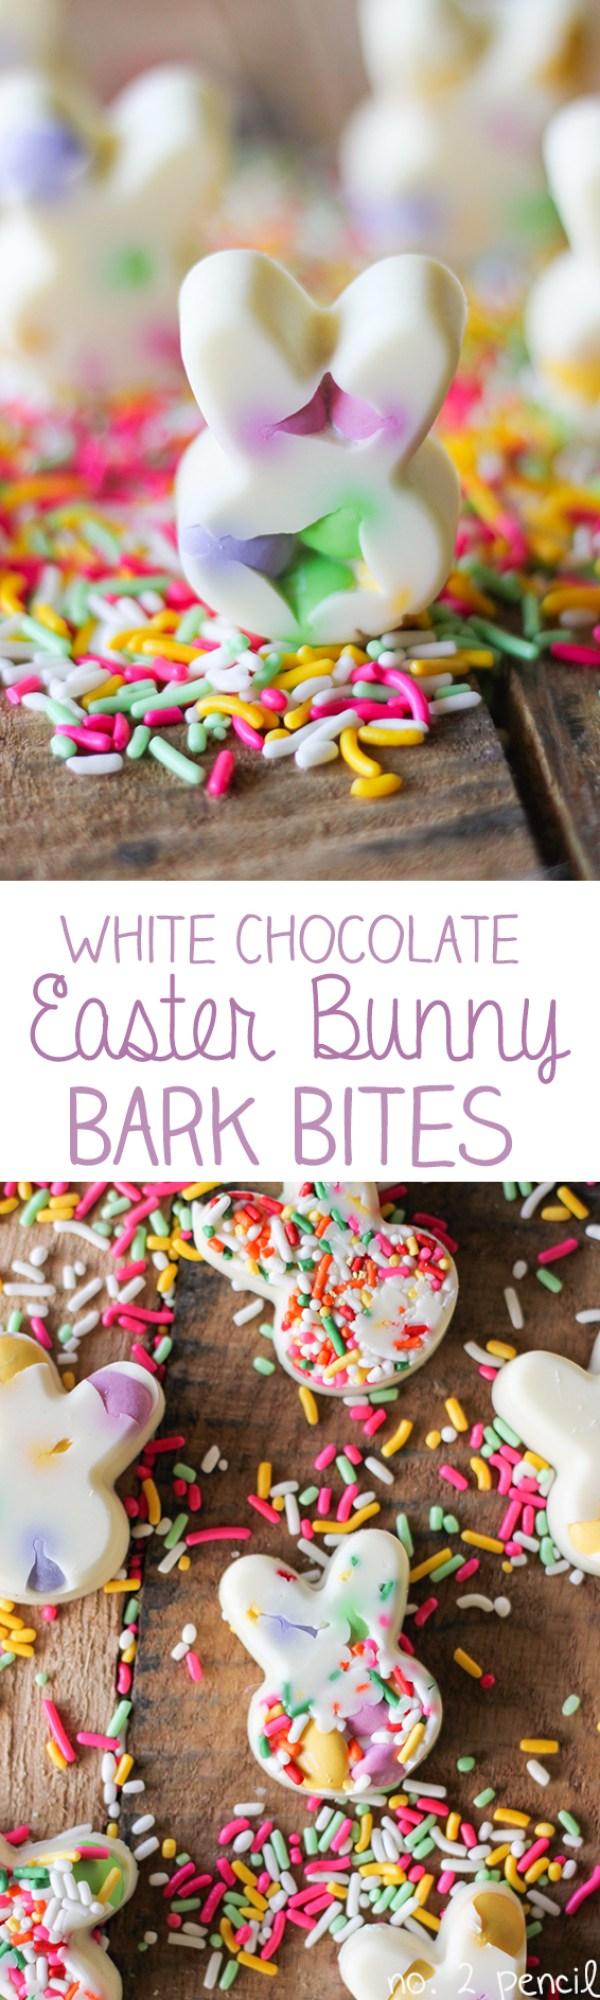 White Chocolate Easter Bunny Bark Bites